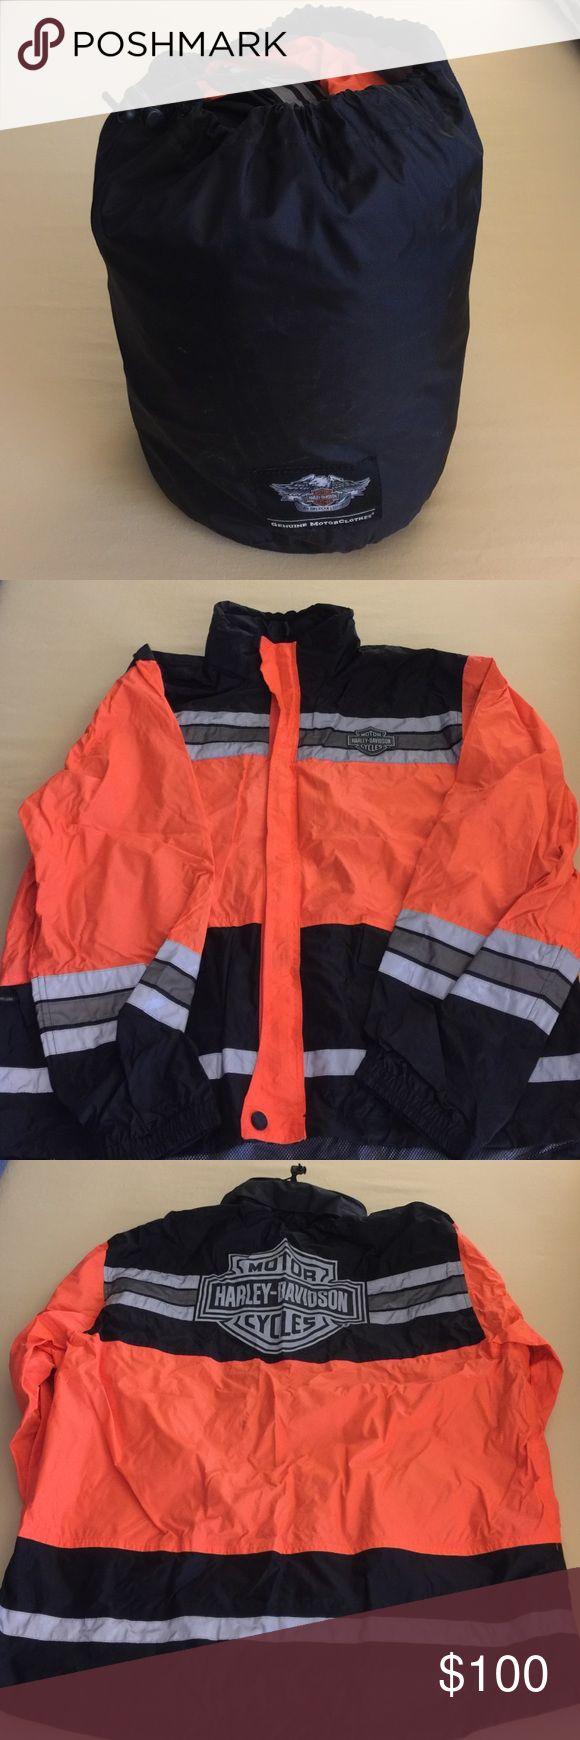 Harley Davidson Men's Hi-Vis Rain Suit. Harley Davidson Authentic Men's Hi-Vis Rain Suit, size XL.  Great condition, gently worn reflective rain suit.  Sturdy Men's rain suit that looks fantastic on.☔️ Harley-Davidson Other